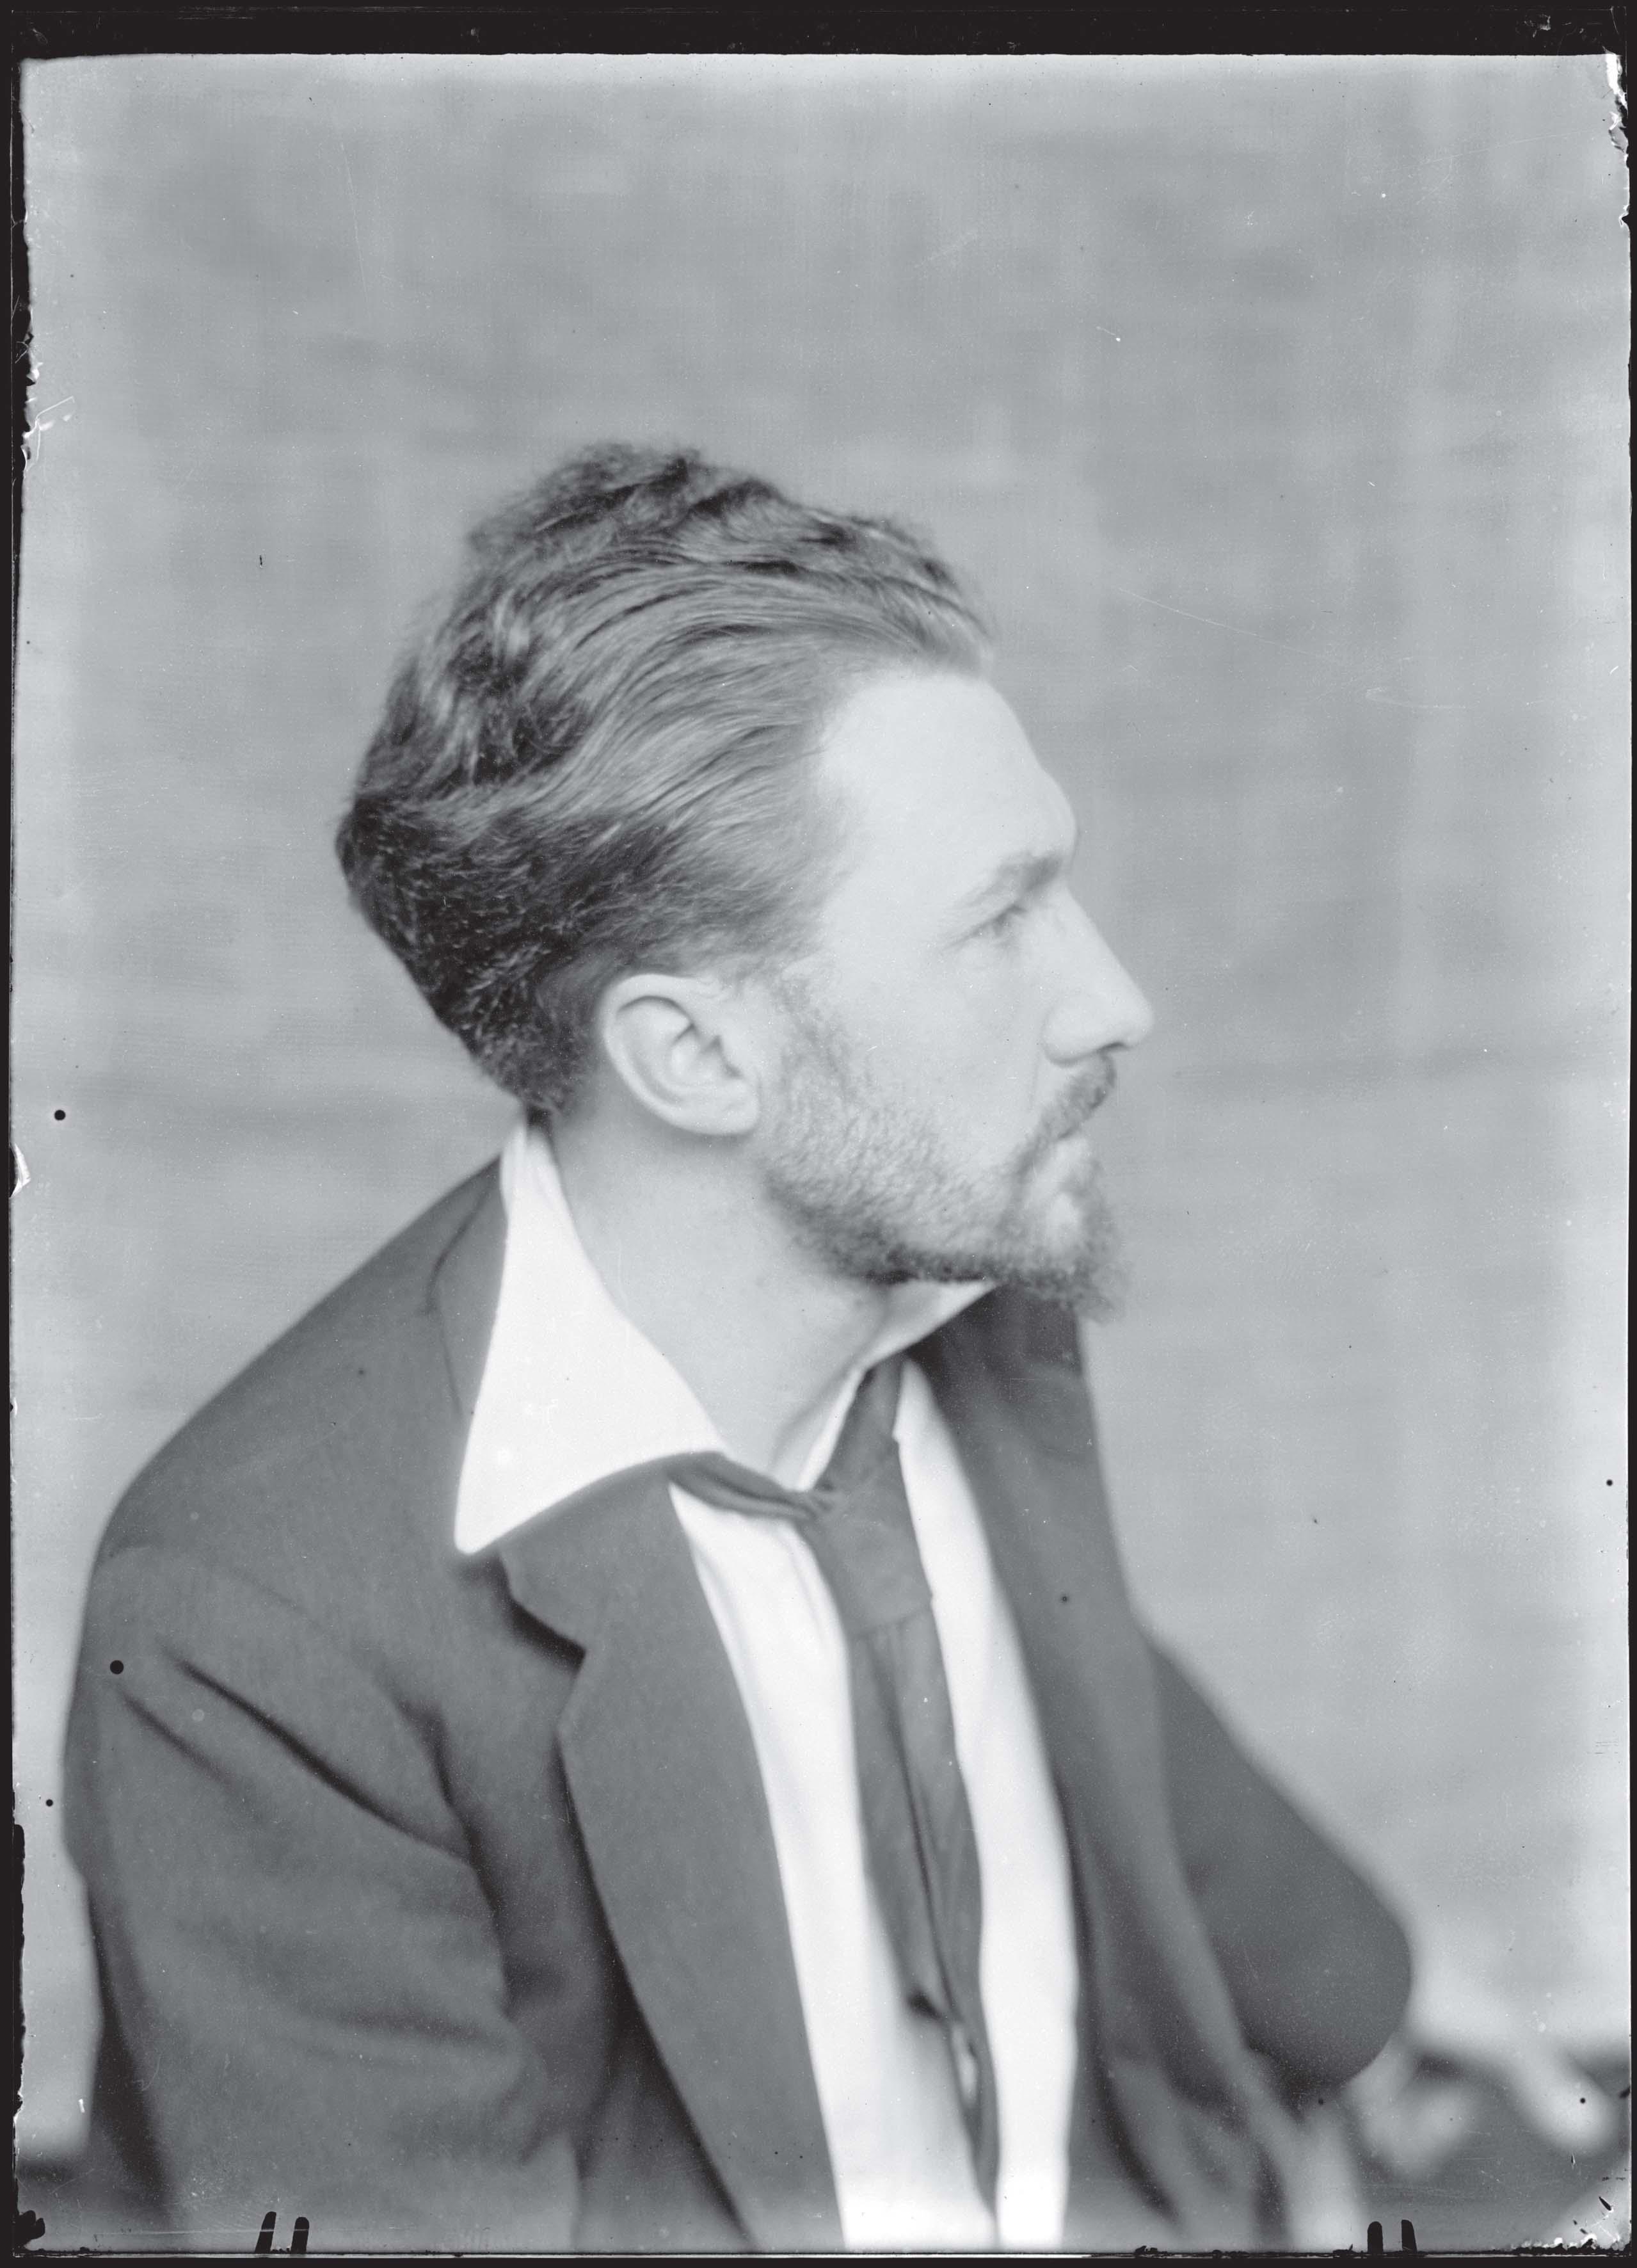 Ezra Pound by Man Ray